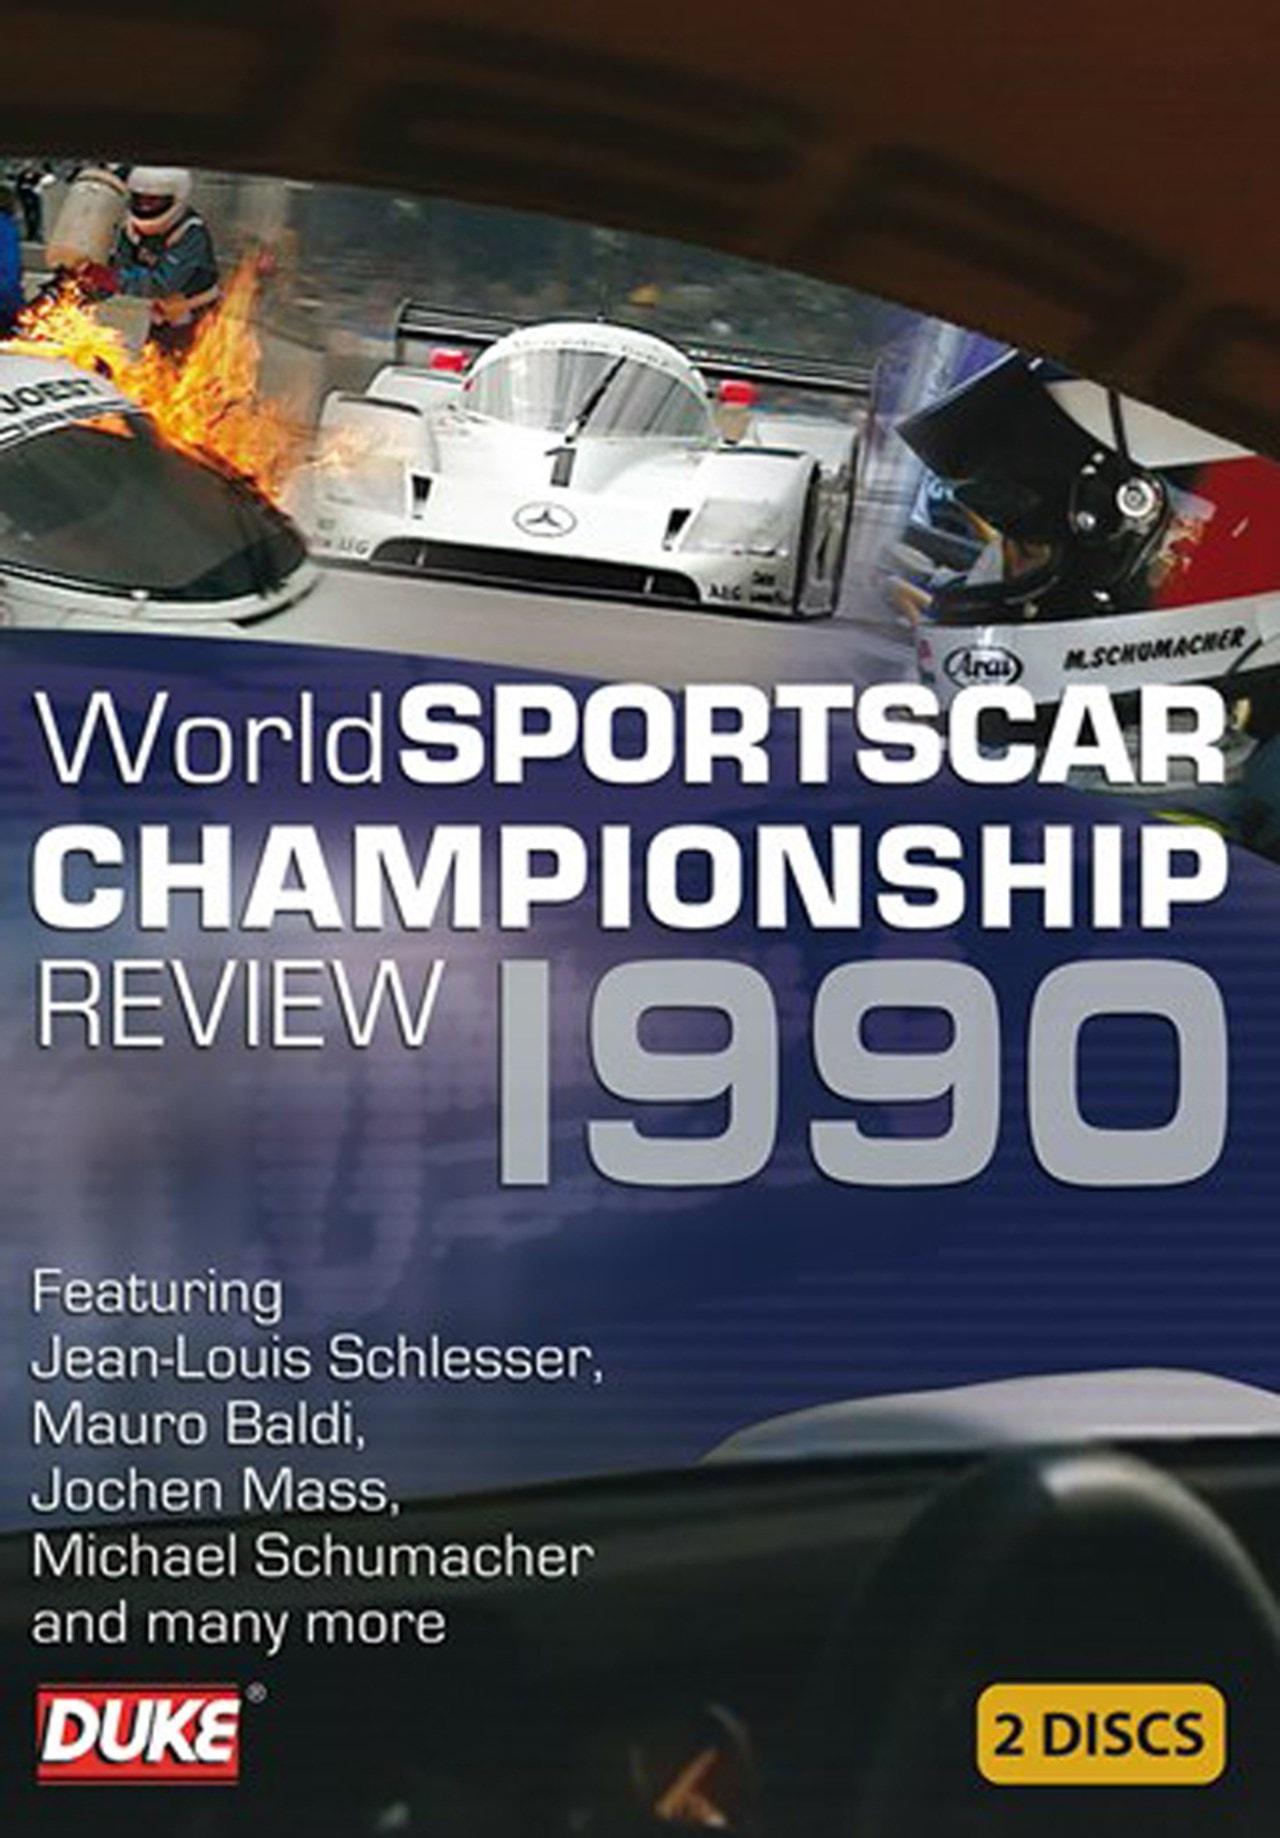 World Sportscar Championship Review: 1990 - 1